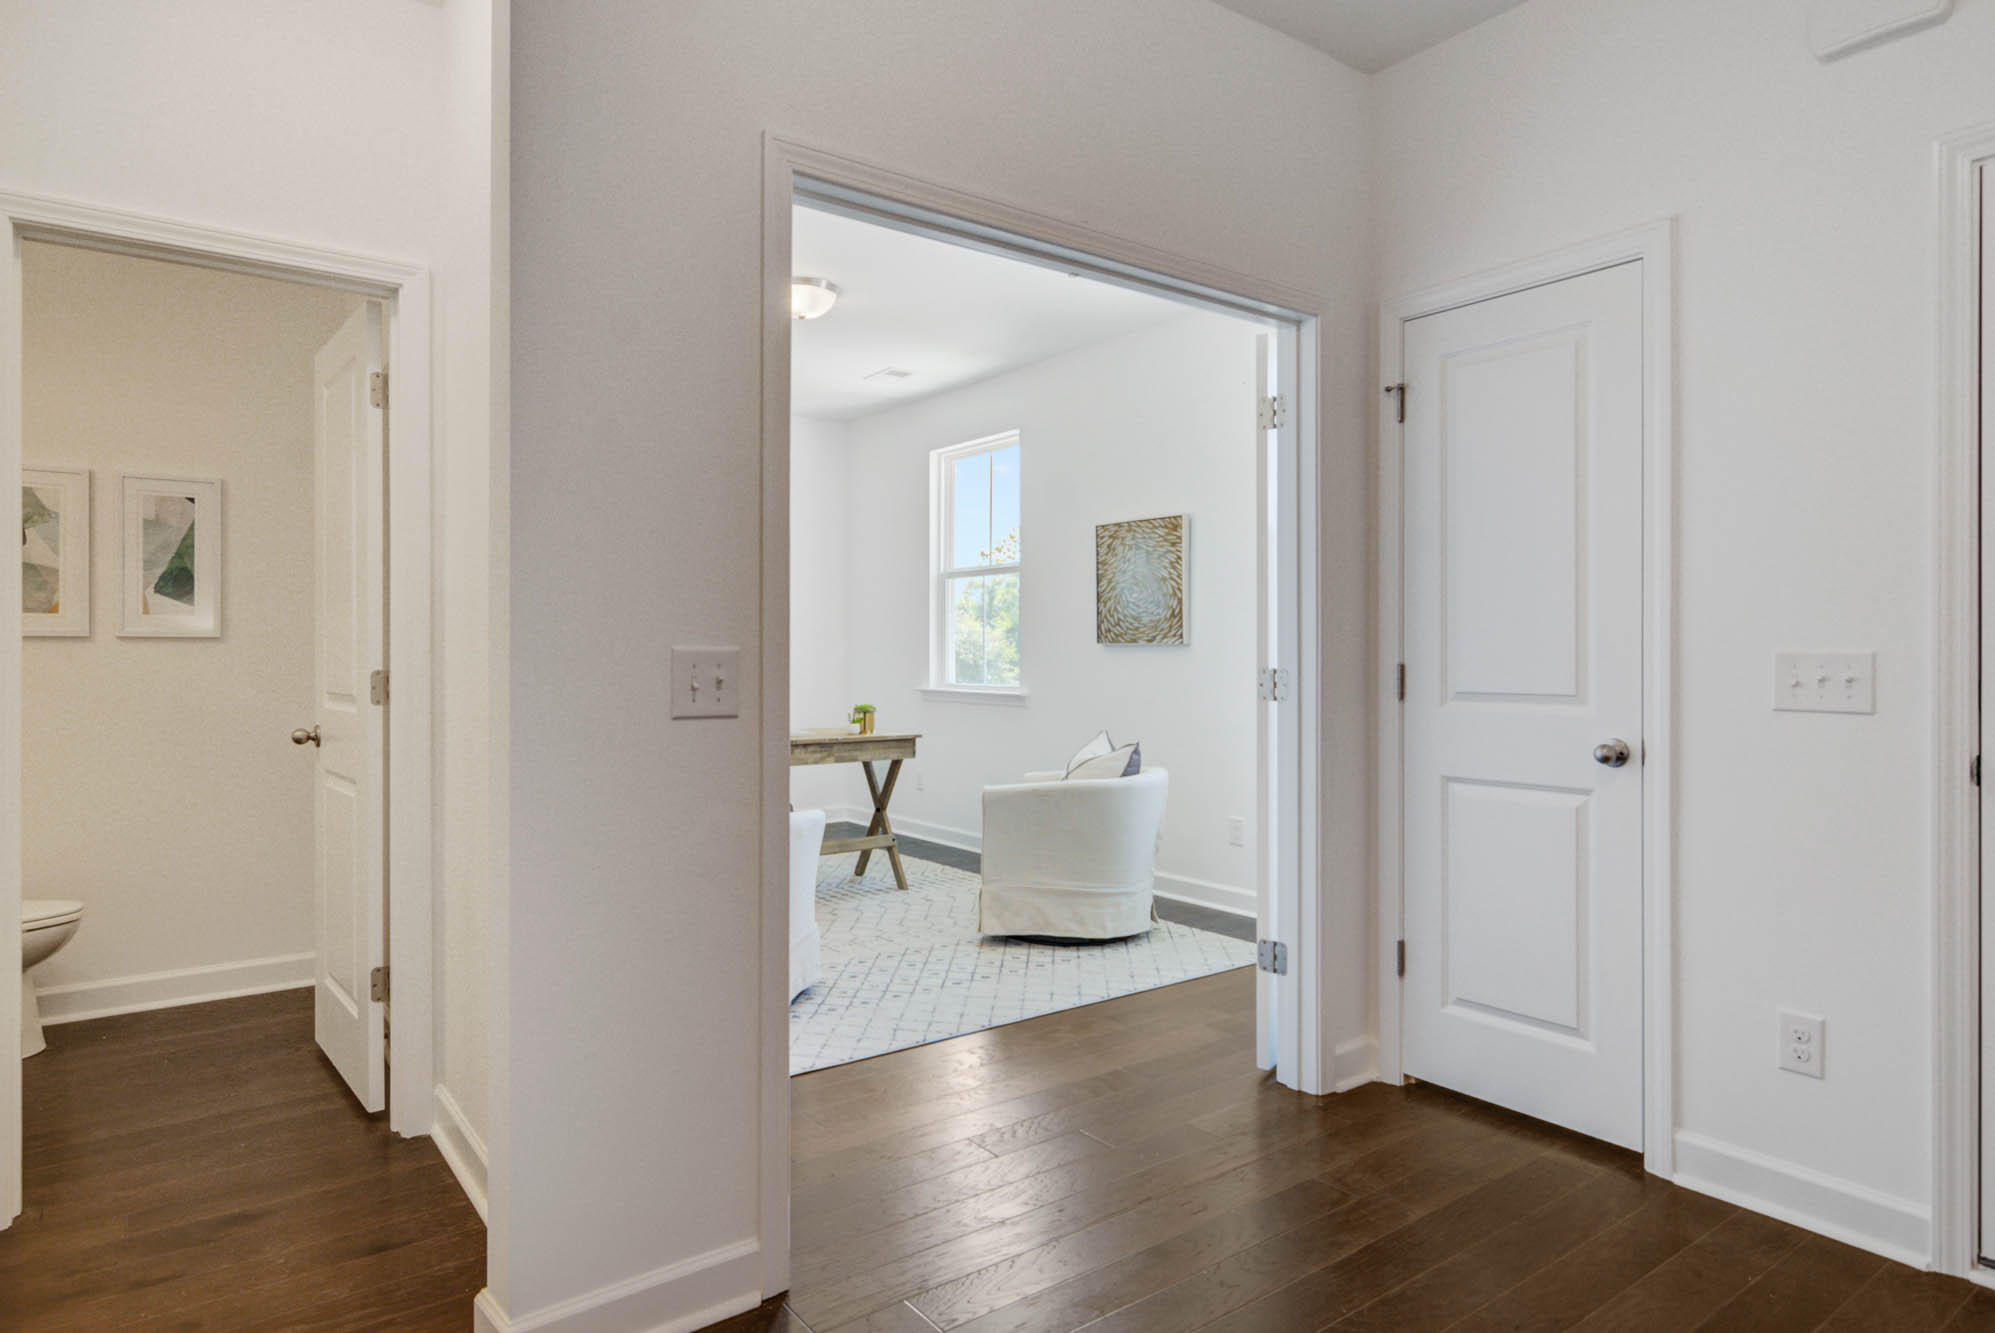 Marshview Commons Homes For Sale - 530 Mclernon, Johns Island, SC - 12